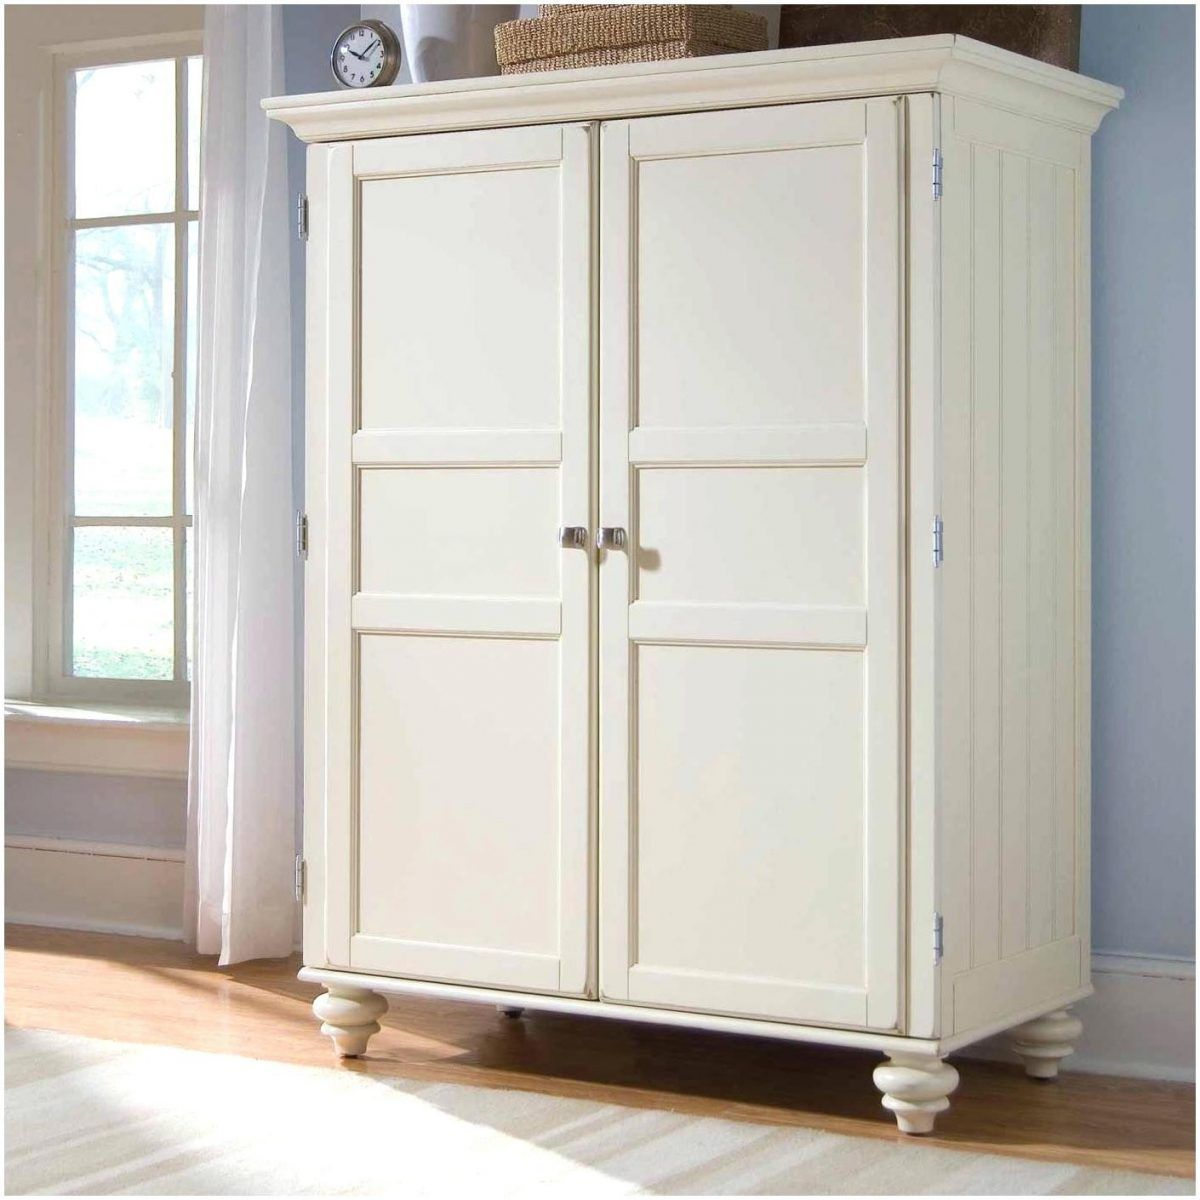 Armoire Plans Beautiful Imposing Decoration Ashley Furniture